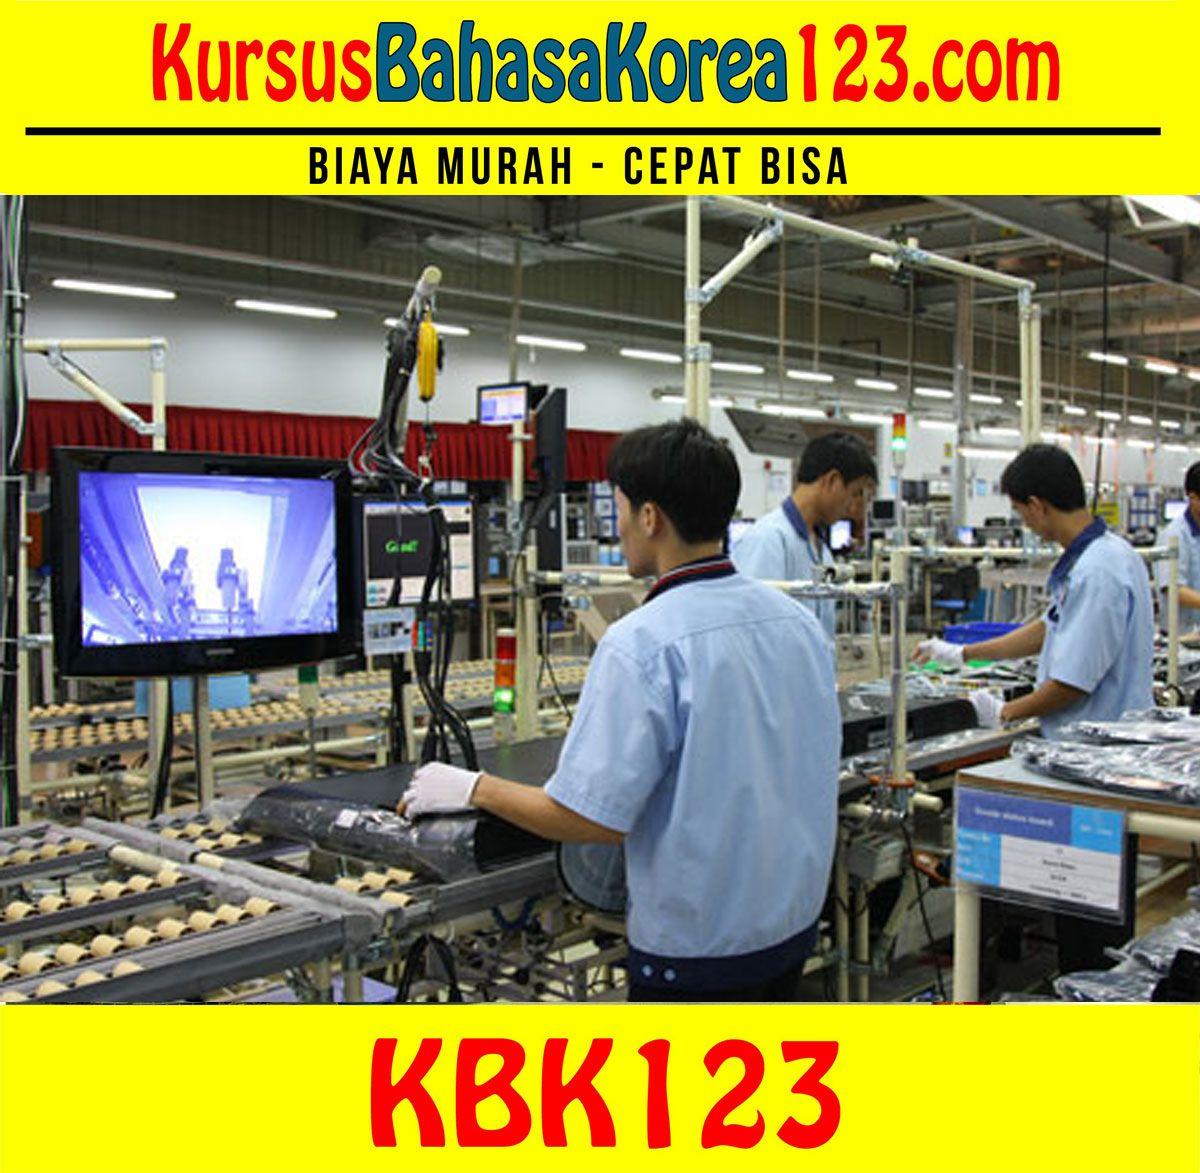 Kursus Bahasa Korea Langsung Kerja Bahasa Korea Korea Bahasa